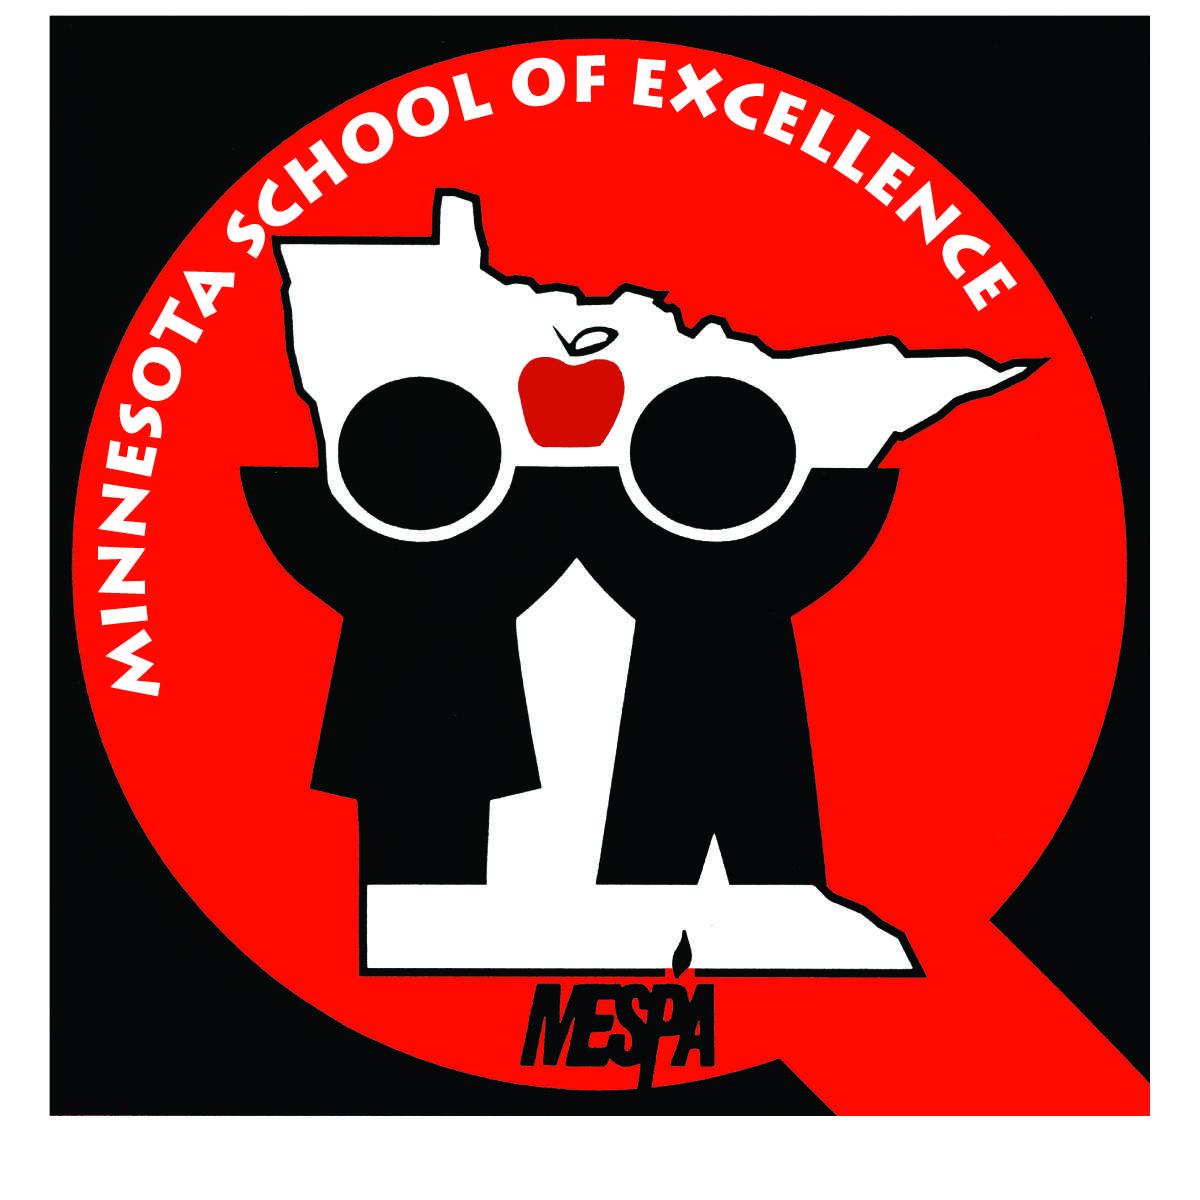 MESPA Schl of Ex logo